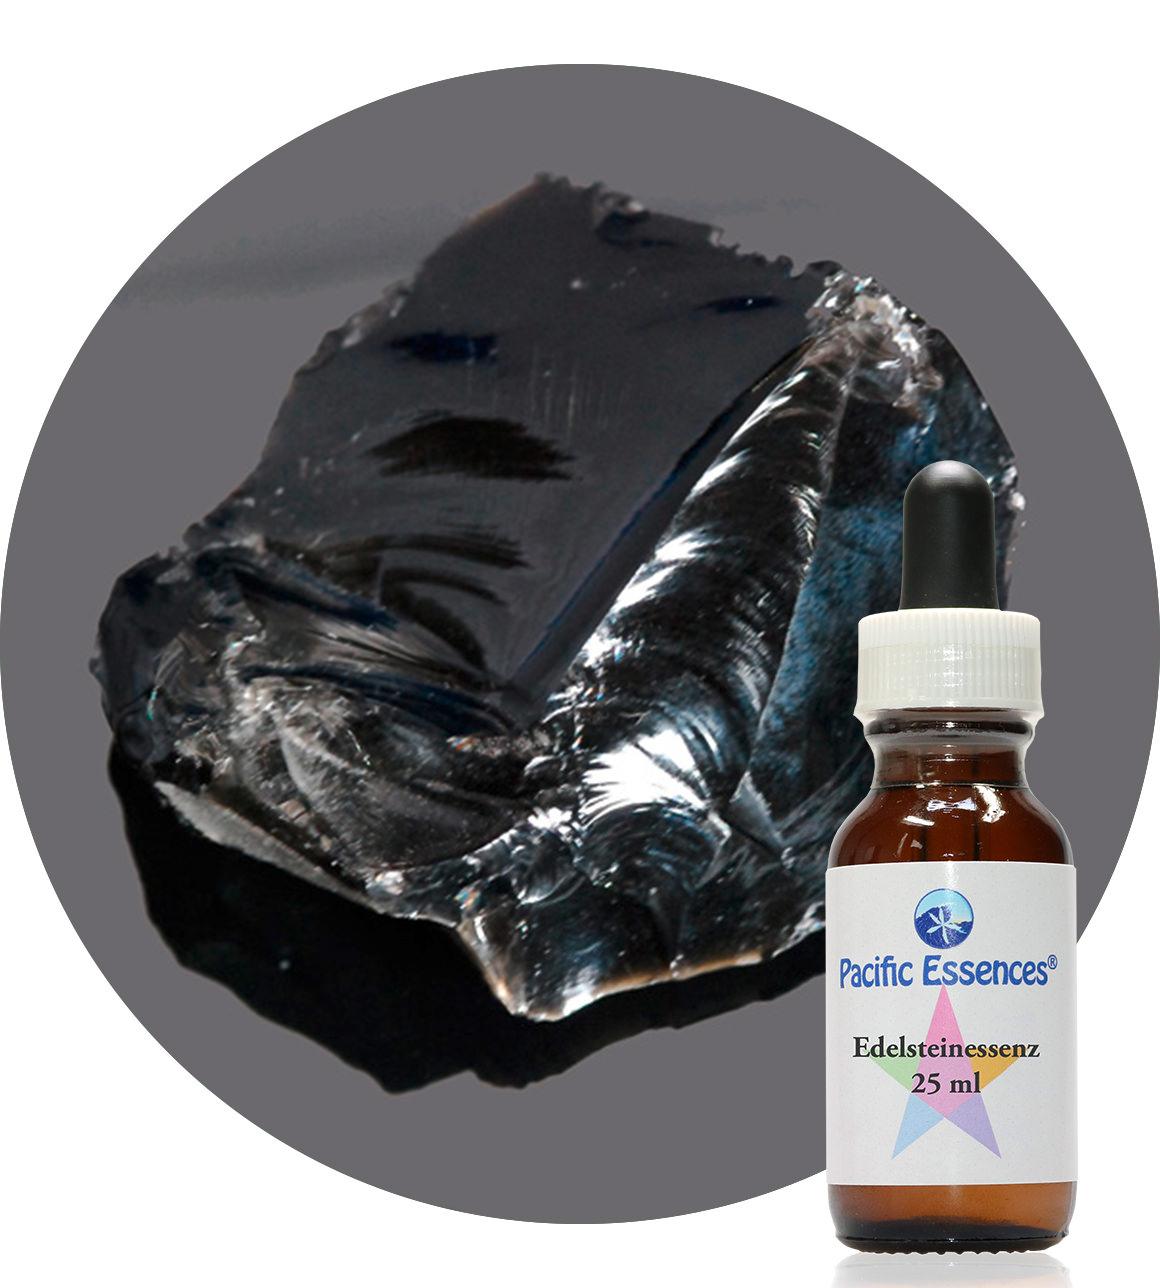 Obsidian (Pacific Essences)